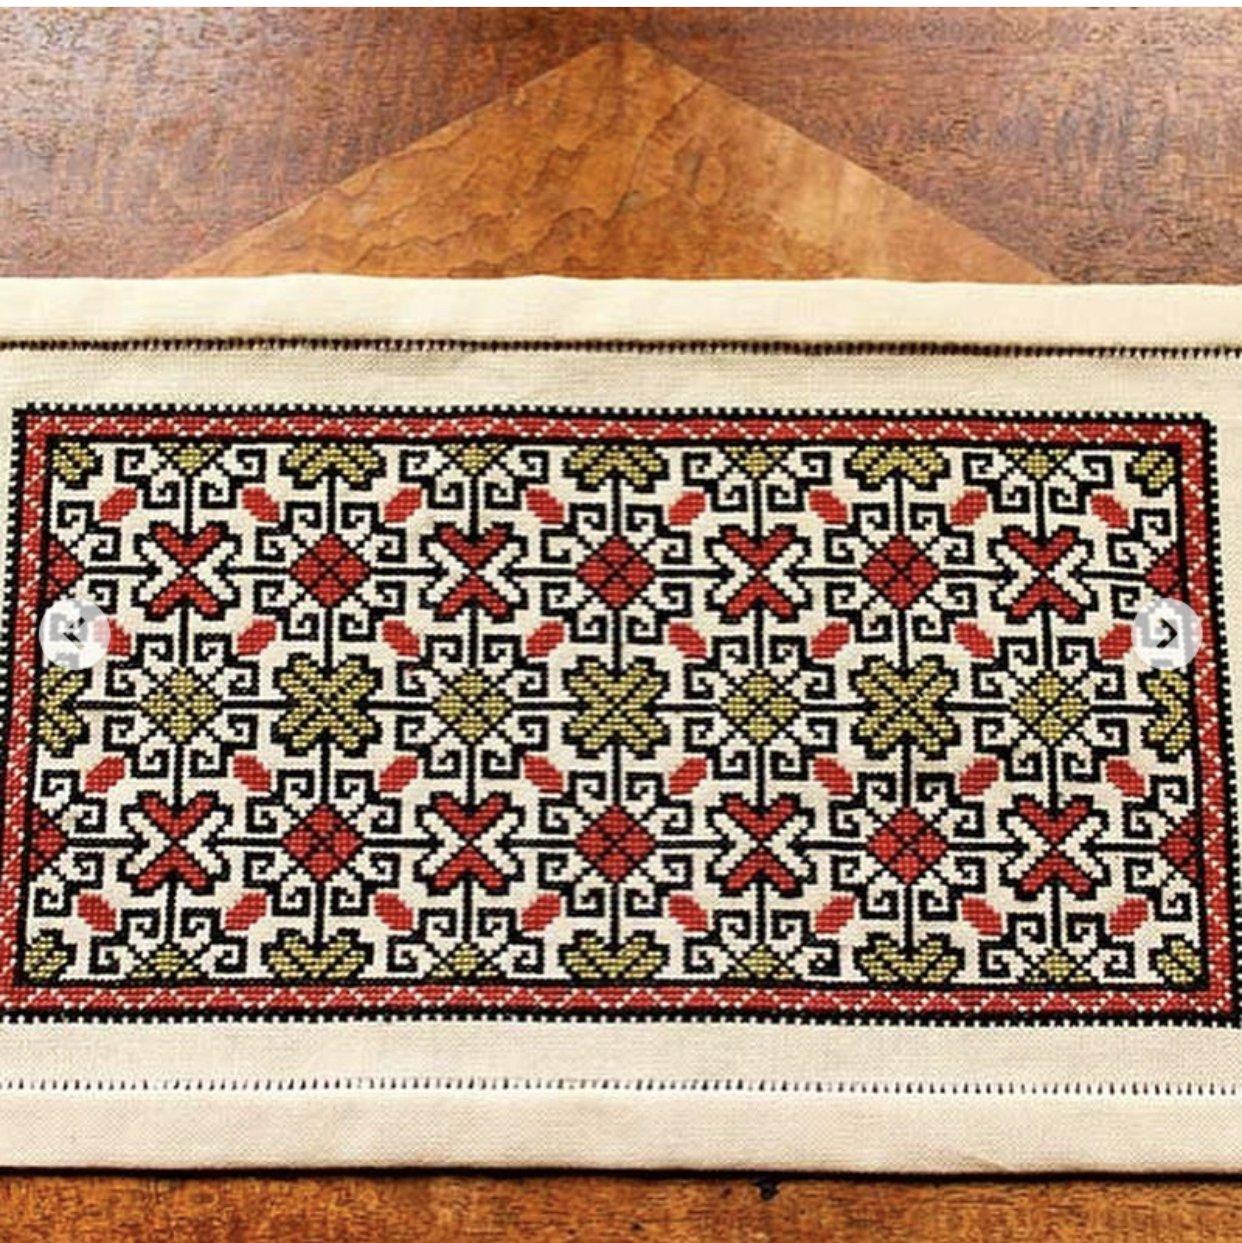 Avalea Mediterranean Folk Embroidery Nashville Release